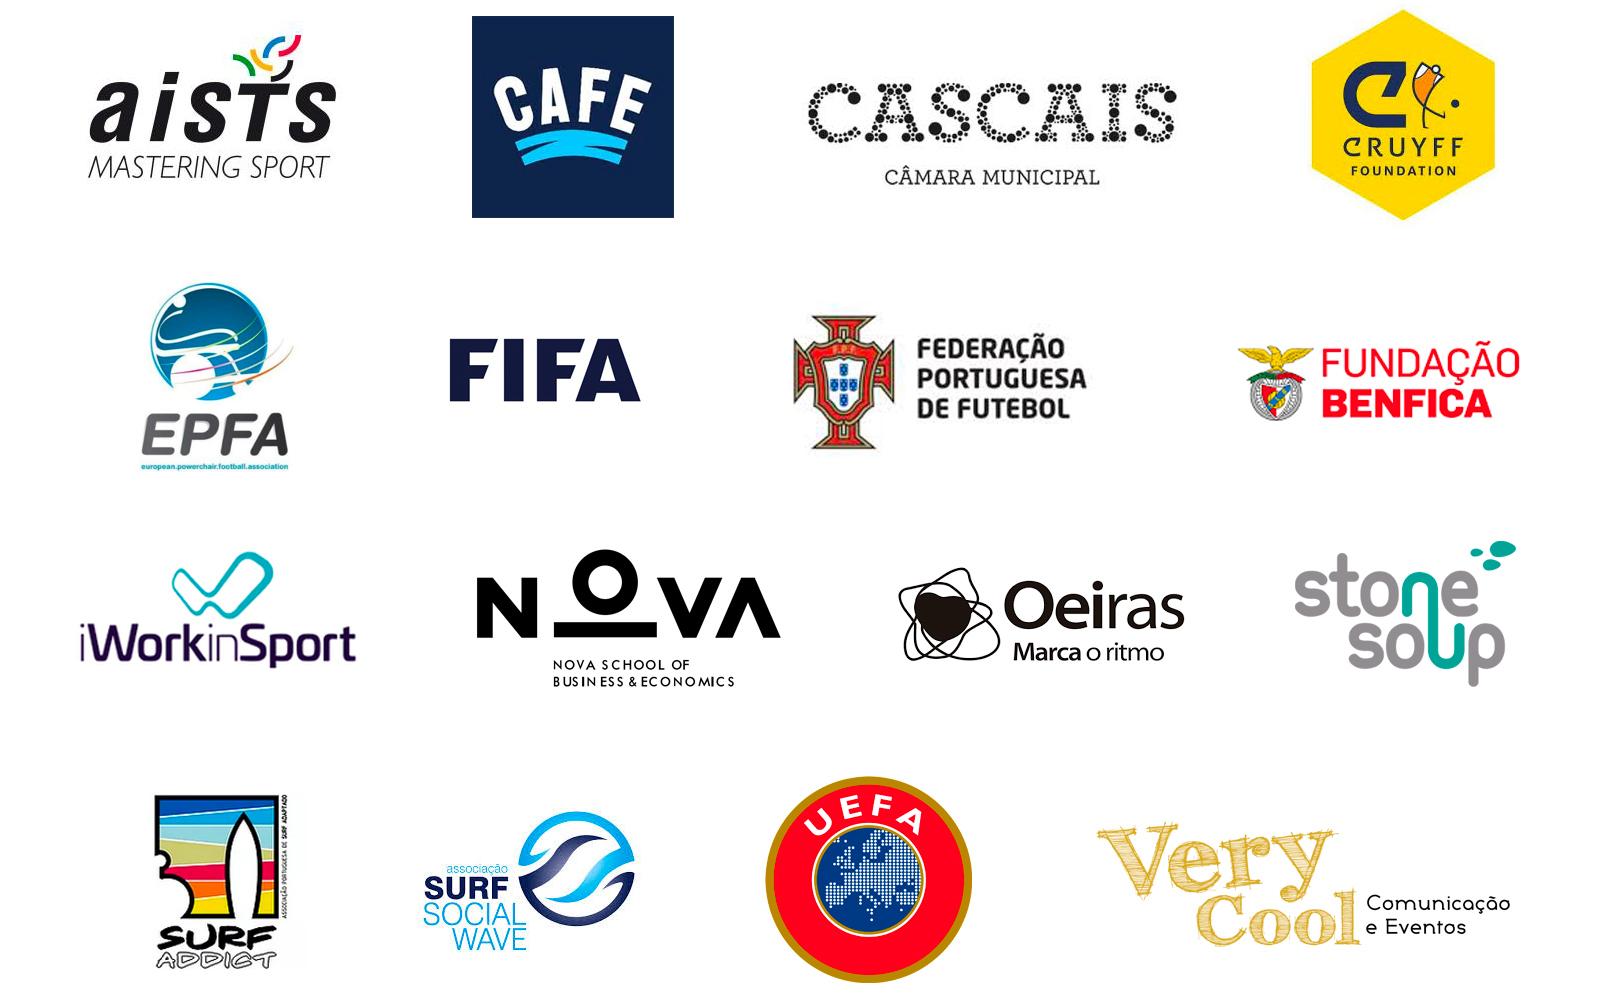 FFALP partners logos: aists, CAFE, City of Cascais, Johan Cruyff Foundation, EPFA, FIFA, Portuguese FA, Benfica Foundation, iWorkinSport, Nova SBE University, City of Oeiras, Stone Soup Consulting, Surf Addict Adapted Surf Association, Surf Social Wave, UEFA and Very Cool Events